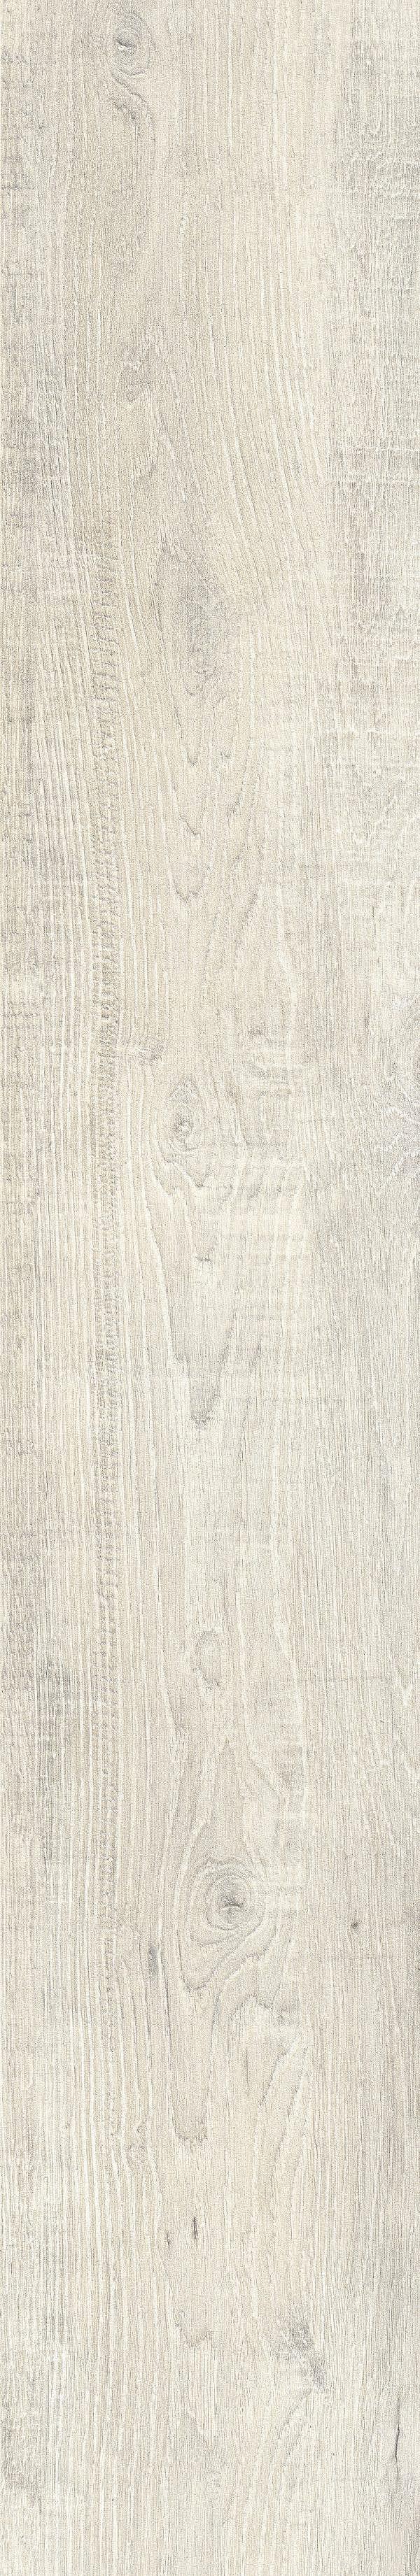 Molise-grijs-19,5x120